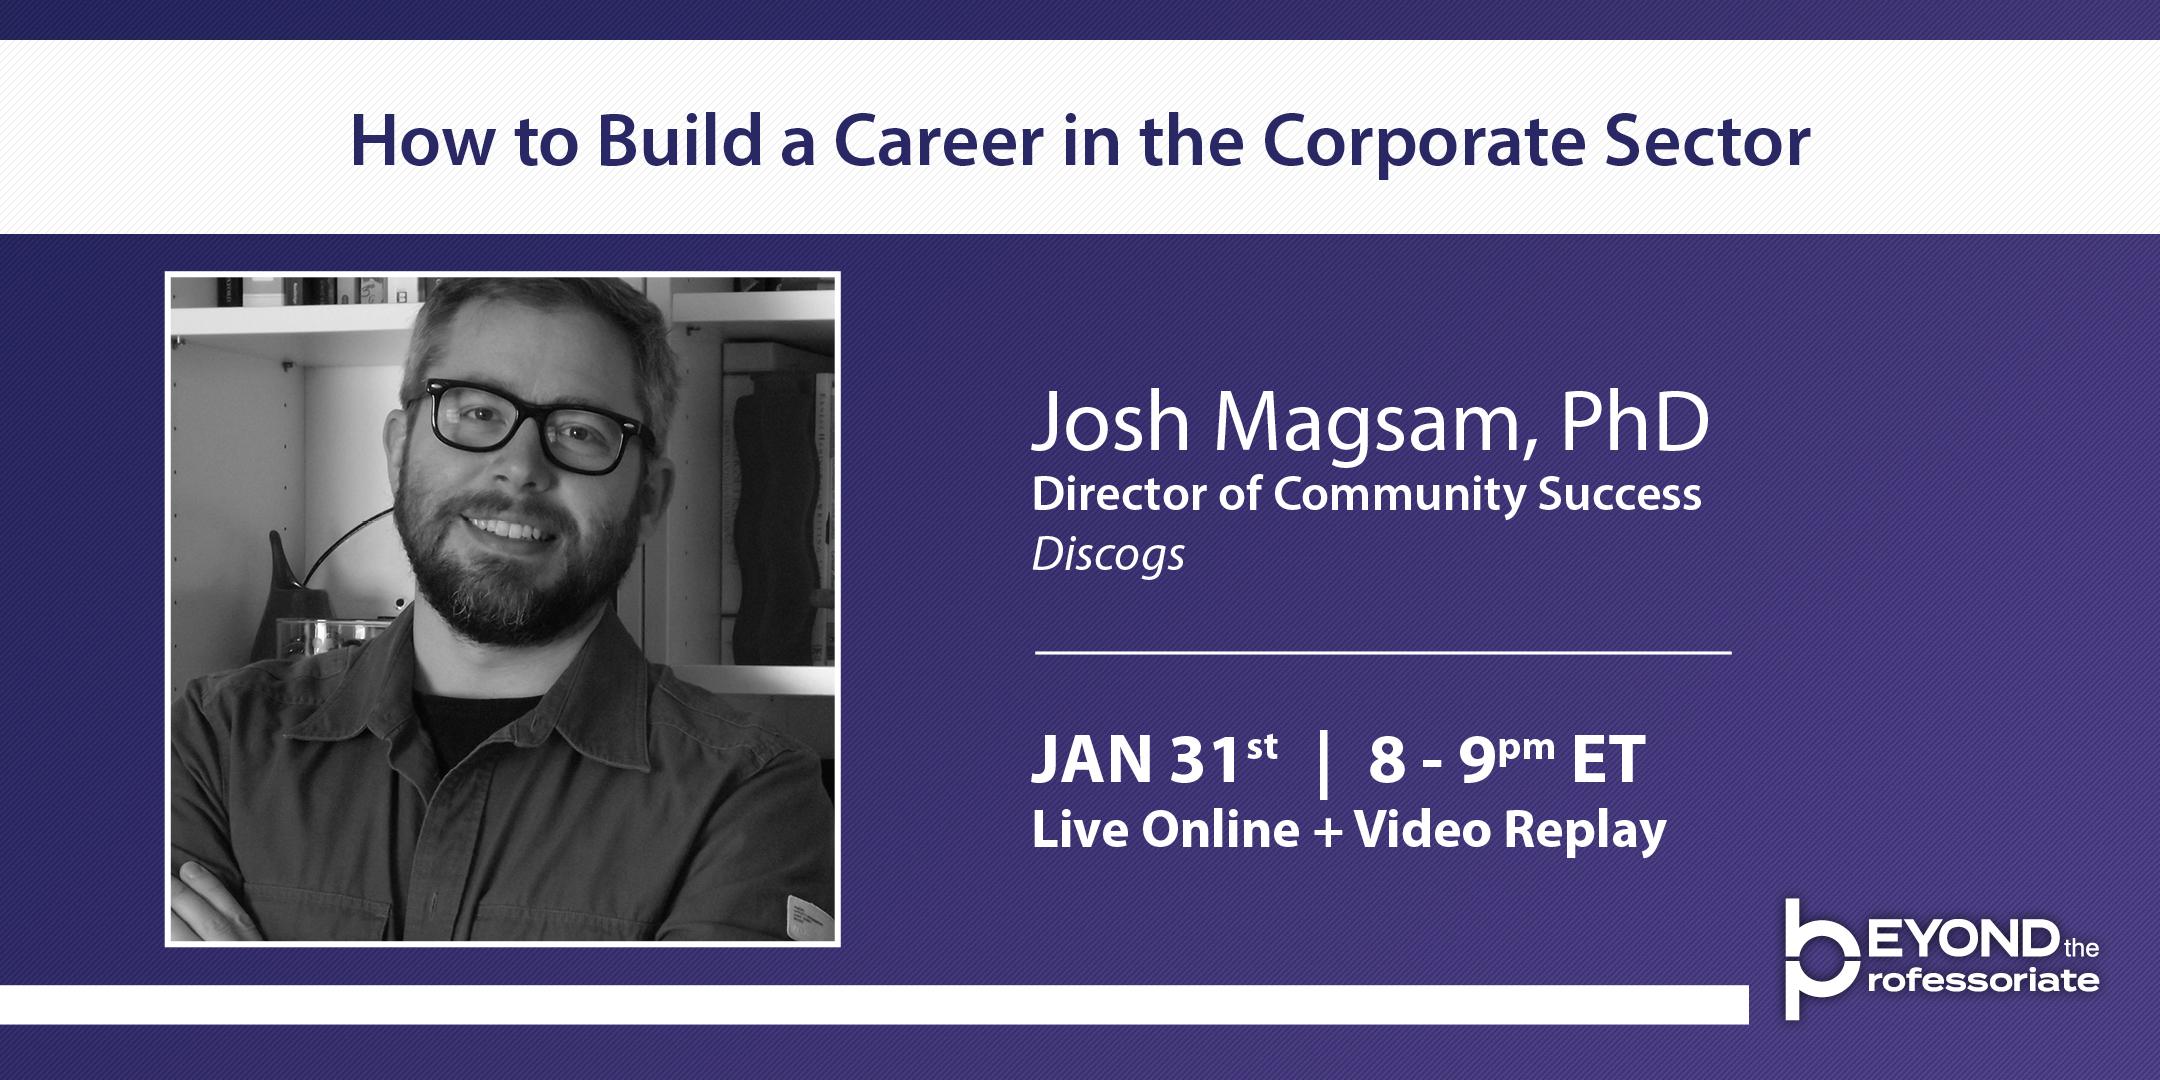 Josh Magsam PhD Beyond the Professoriate